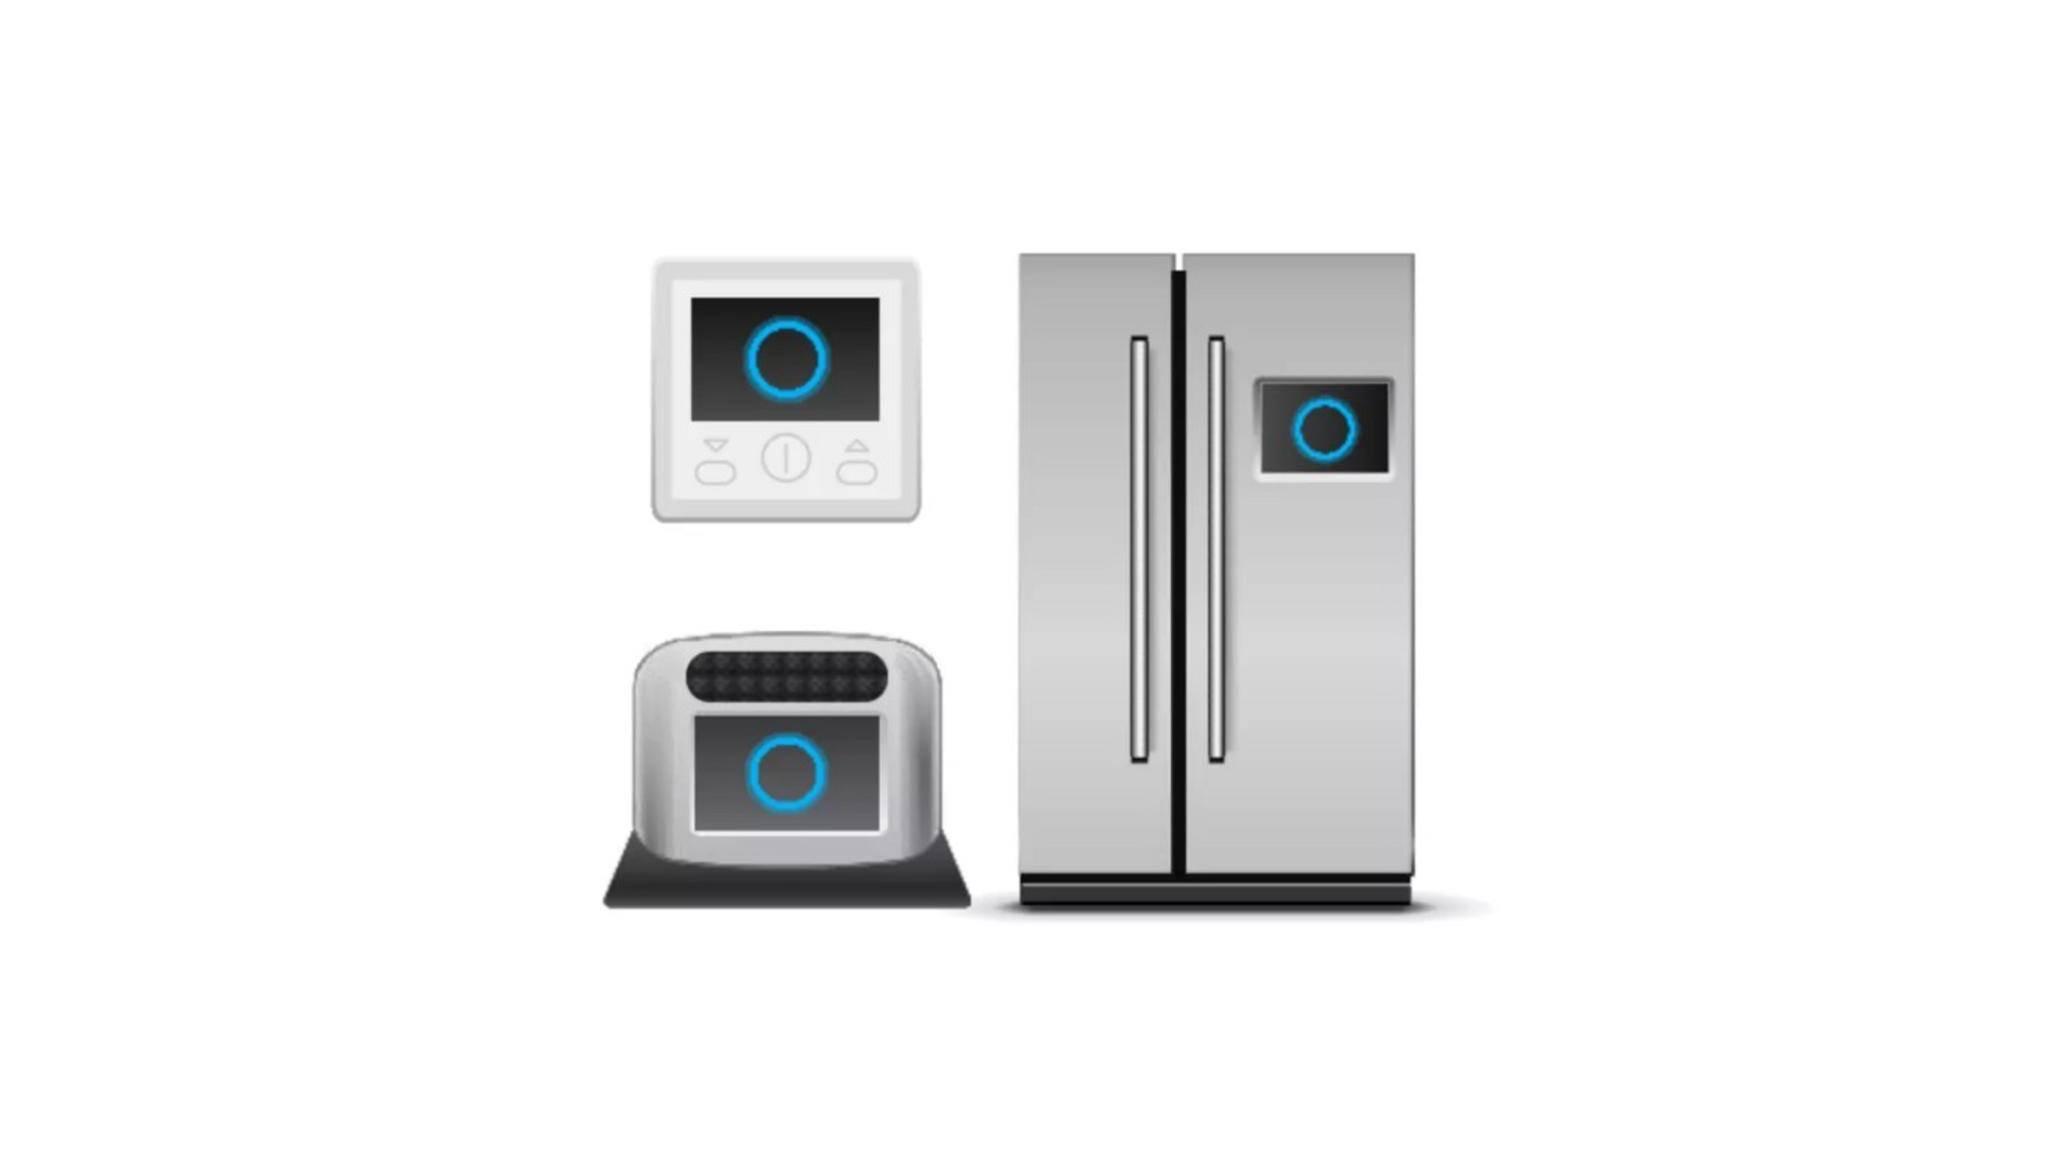 Cortana soll Küchengeräte auskunftsfreudiger machen.